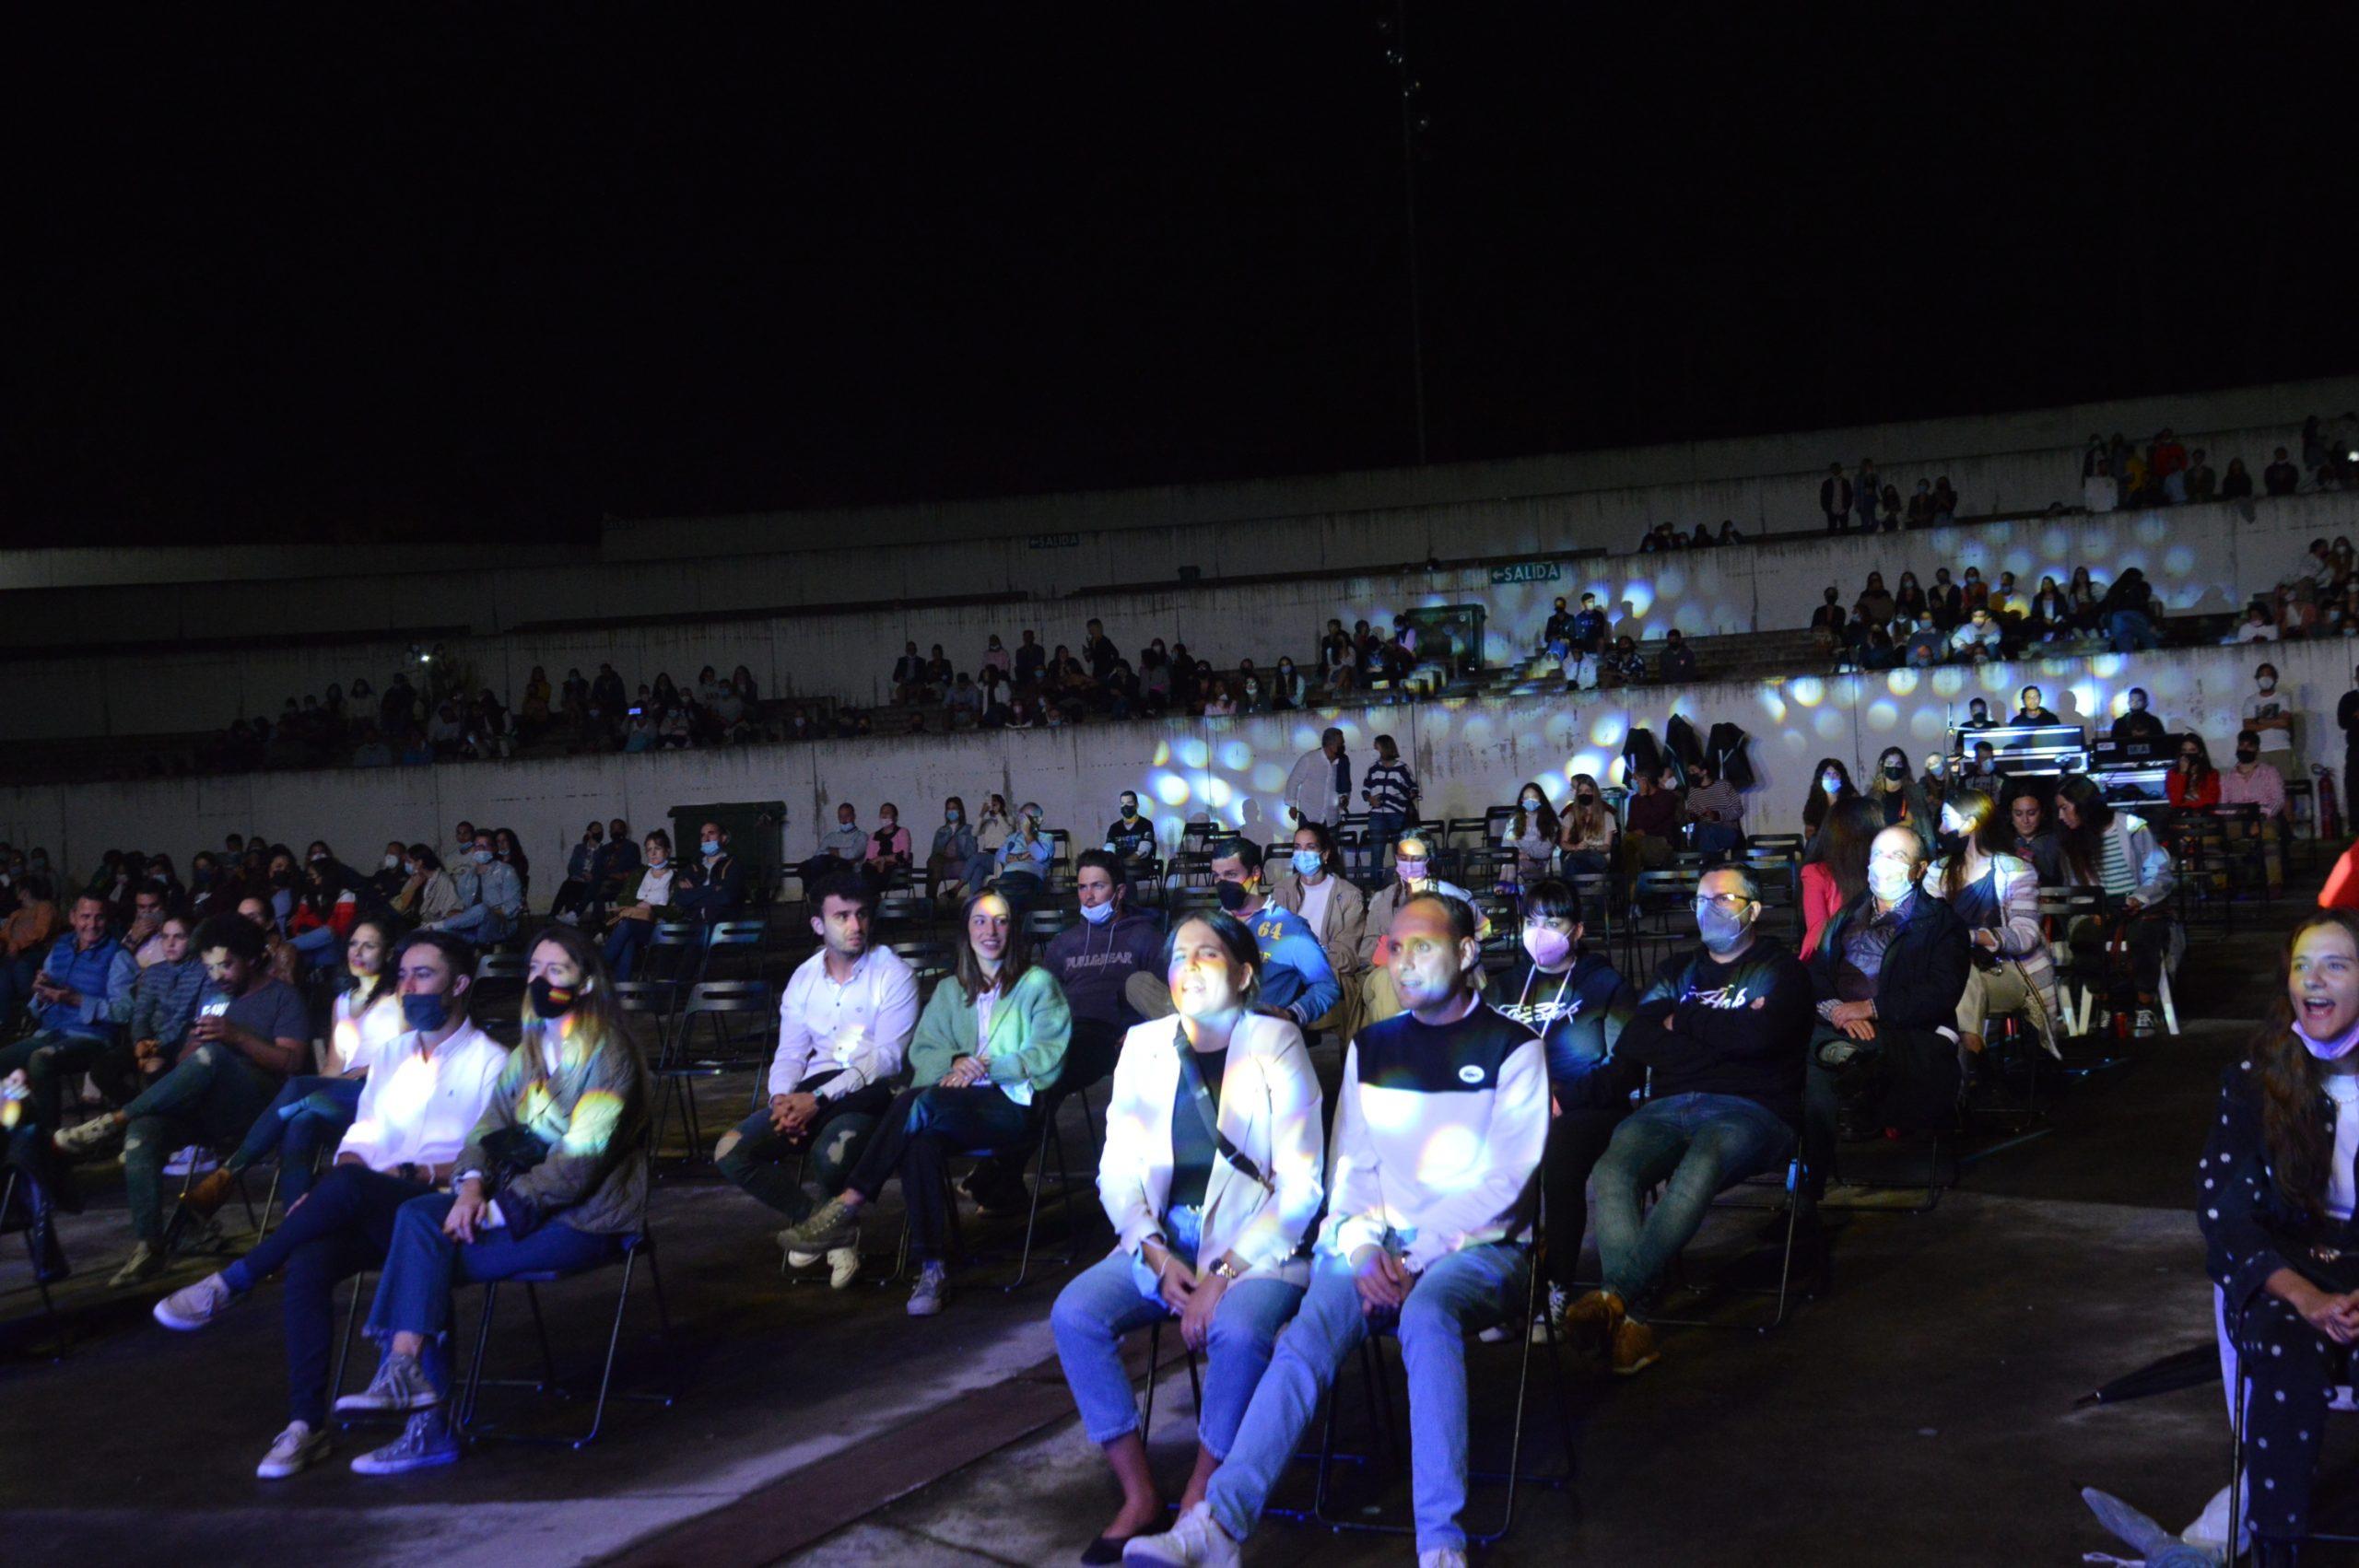 Taburete se entrega a su público en Ponferrada y dan la alternativa al ponferradino Pravlenha 8